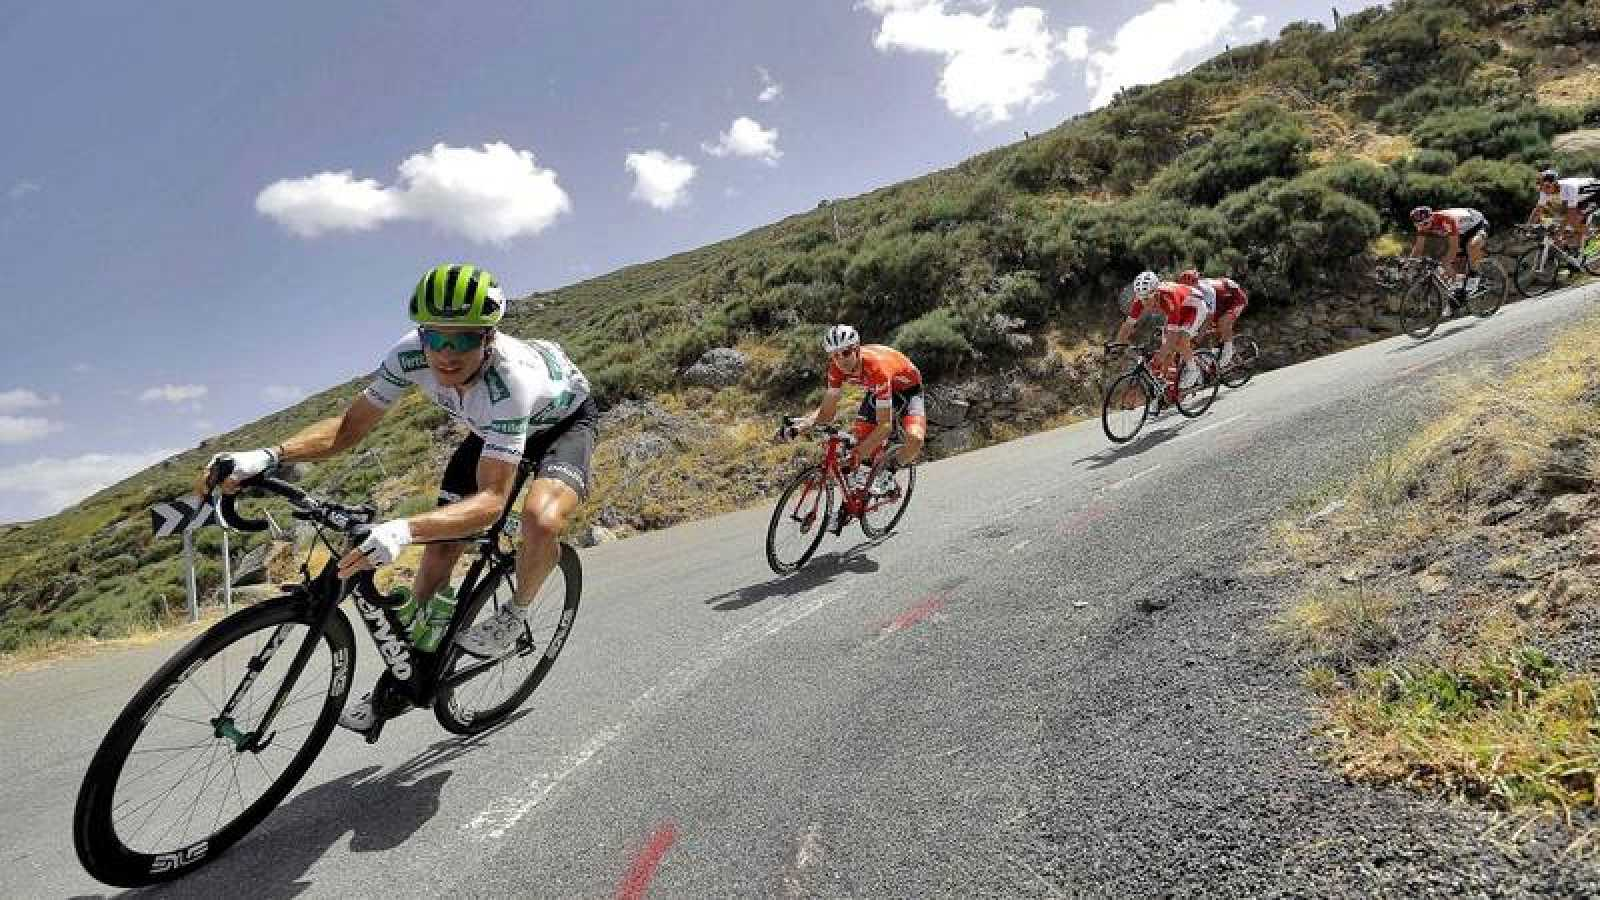 Imagen de la etapa novena de La Vuelta 2018 disputada entre Talavera de la Reina y La Covatilla.